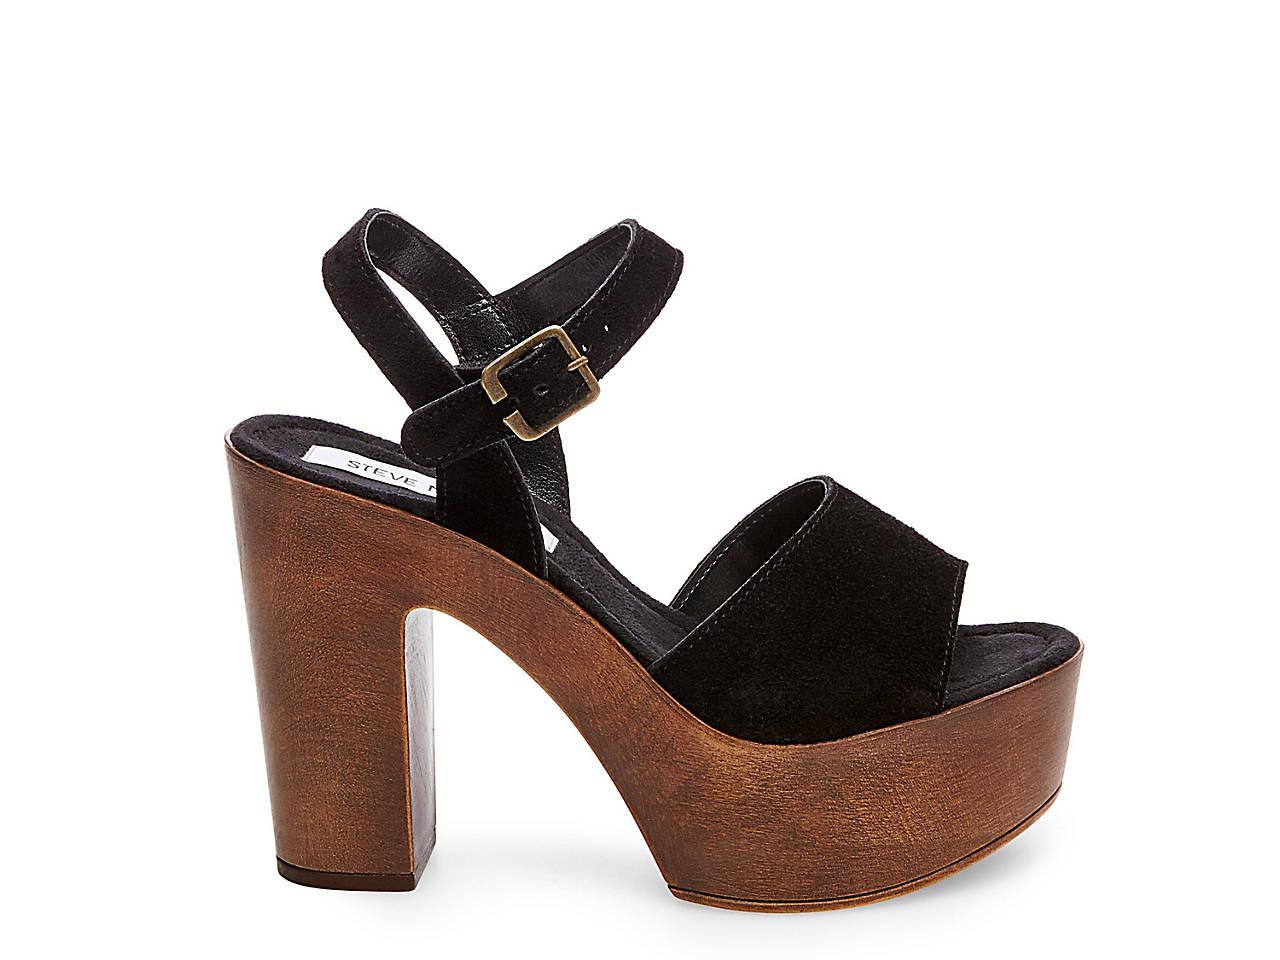 cd7e7e7c6a3a Steve Madden Lulla Platform Sandal Women s Shoes